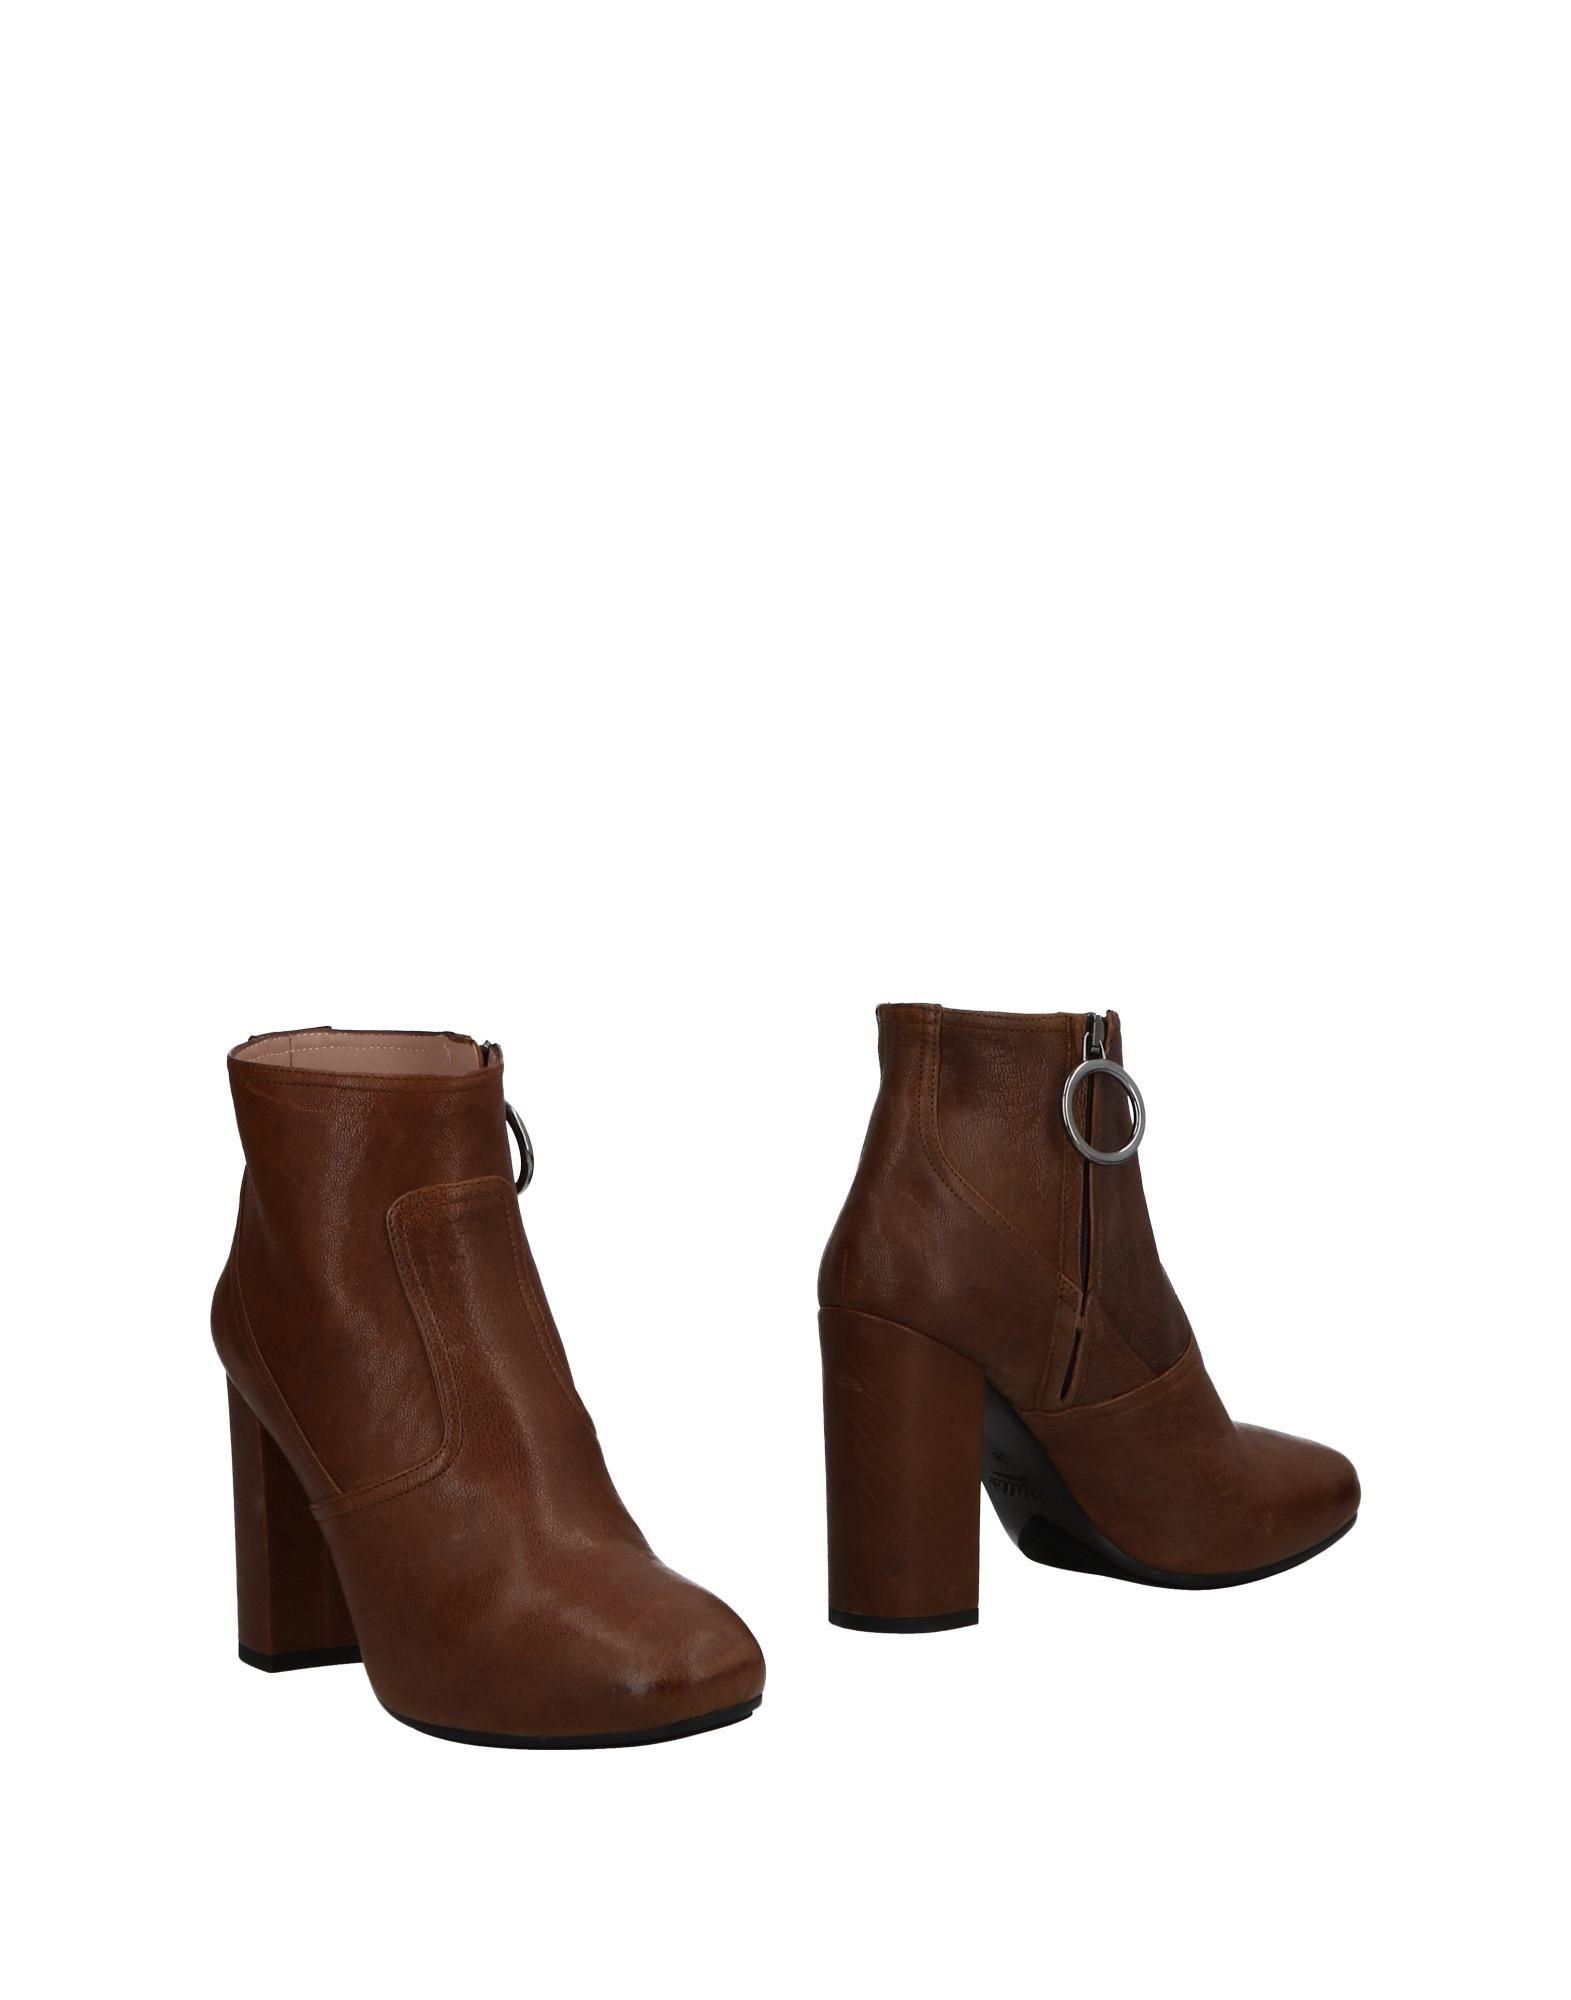 Stilvolle billige Schuhe Millà Stiefelette Damen  11502442JQ 11502442JQ 11502442JQ 50fcfe